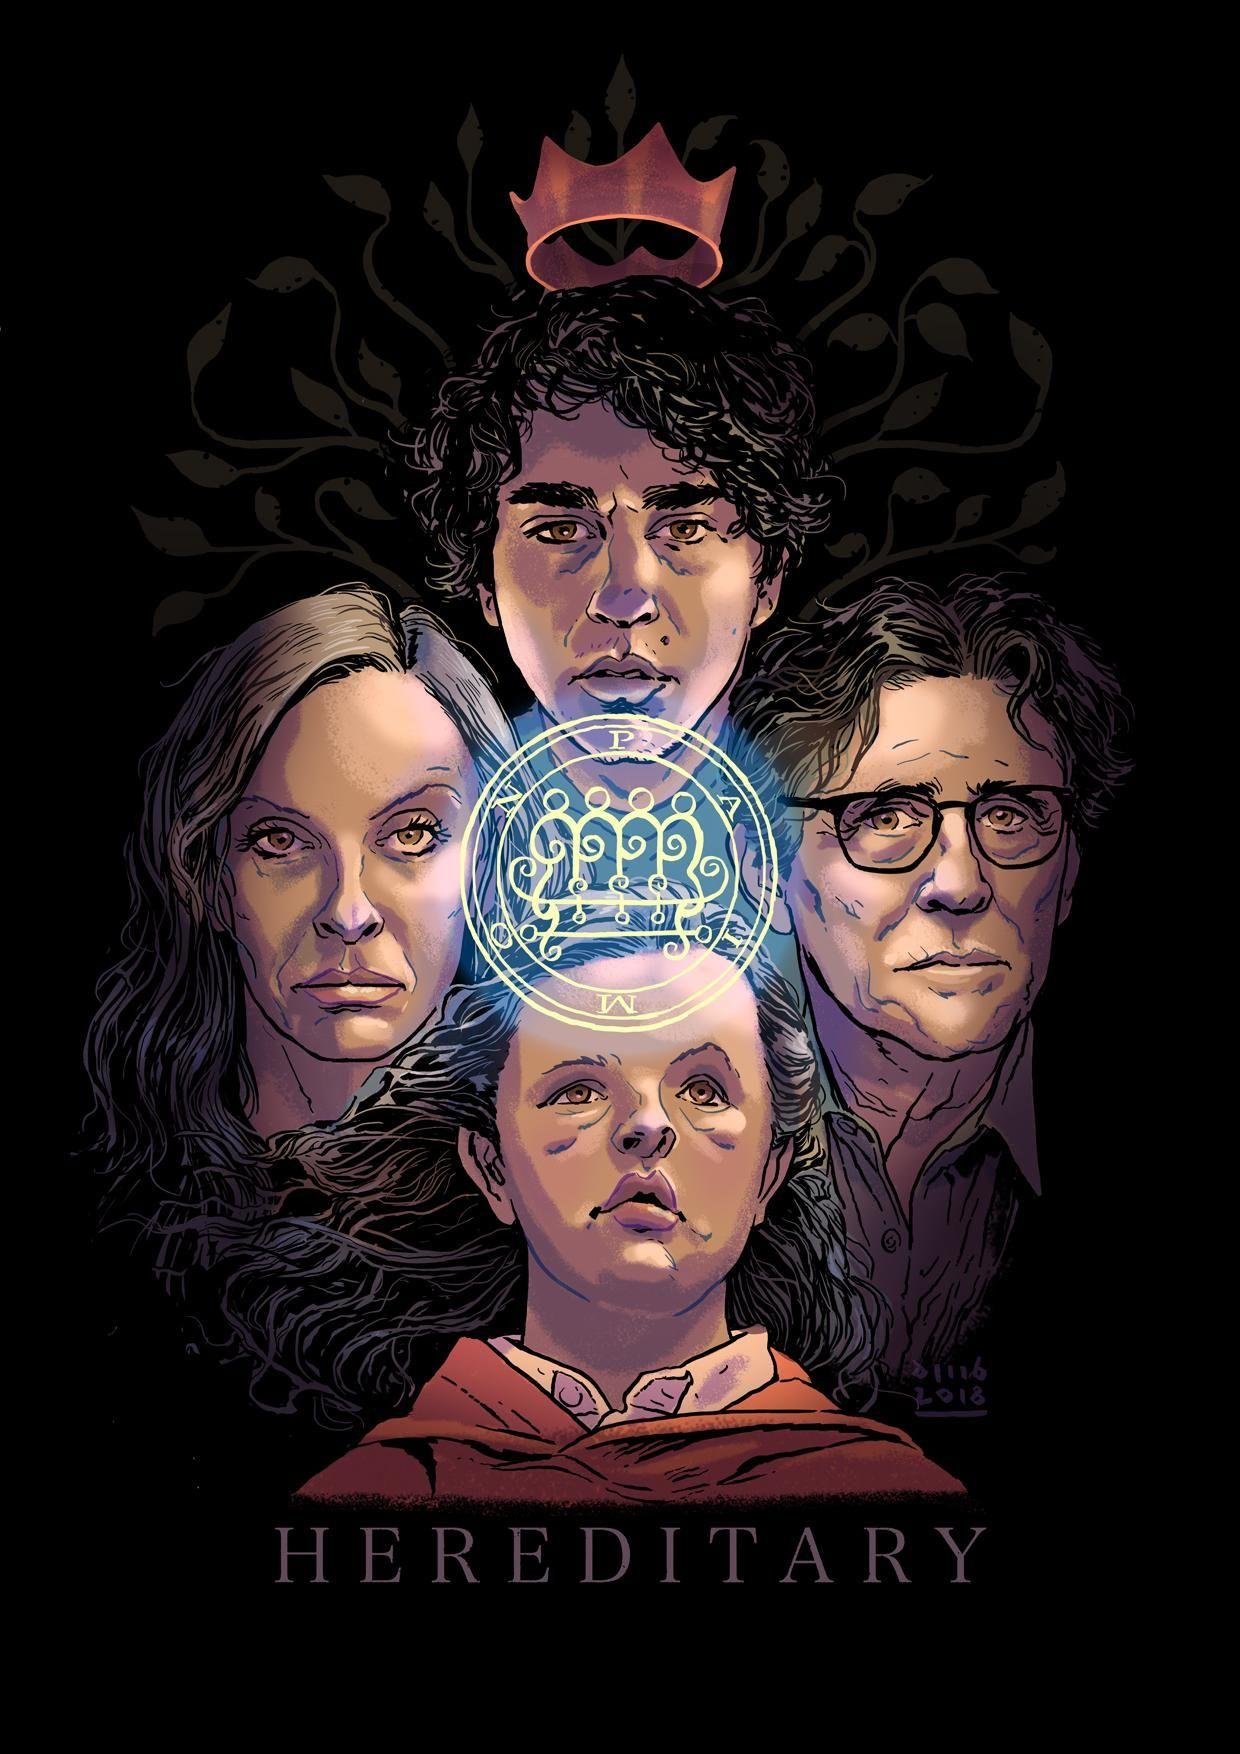 Hereditary 2018 1240 X 1754 Movieposterporn In 2019 Movie